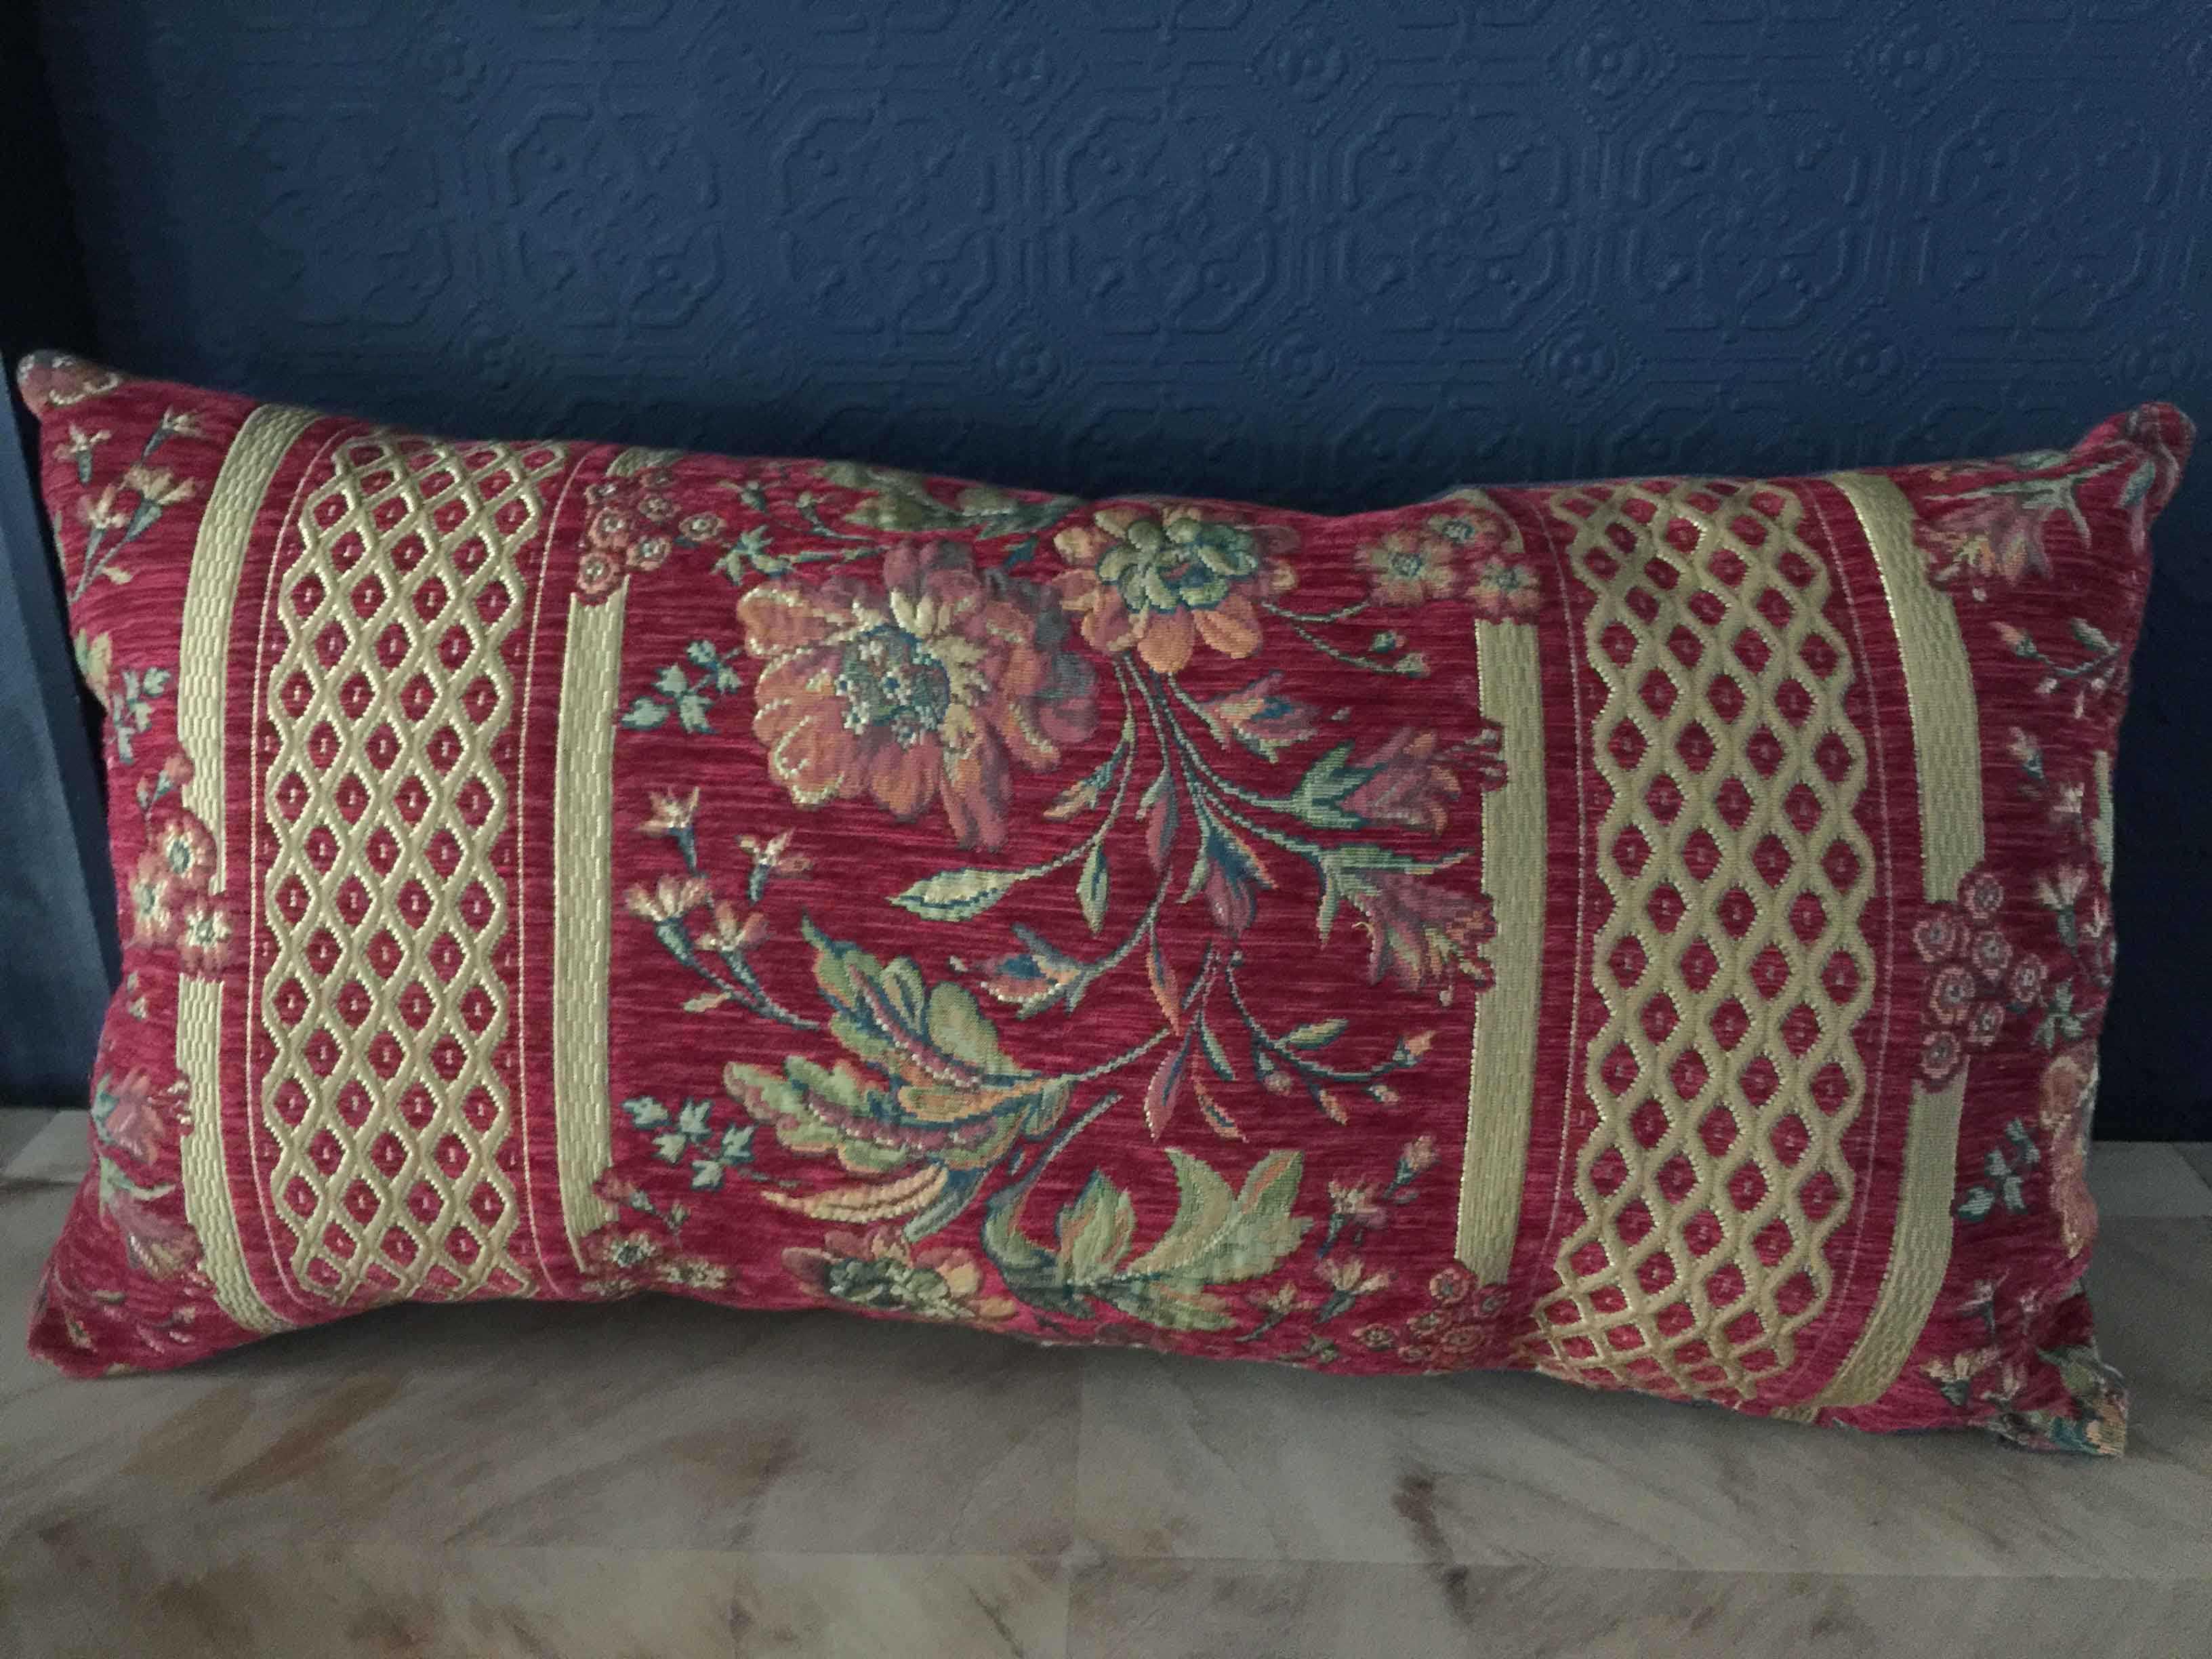 Coussin rectangulaire en tapisserie rouge baroque